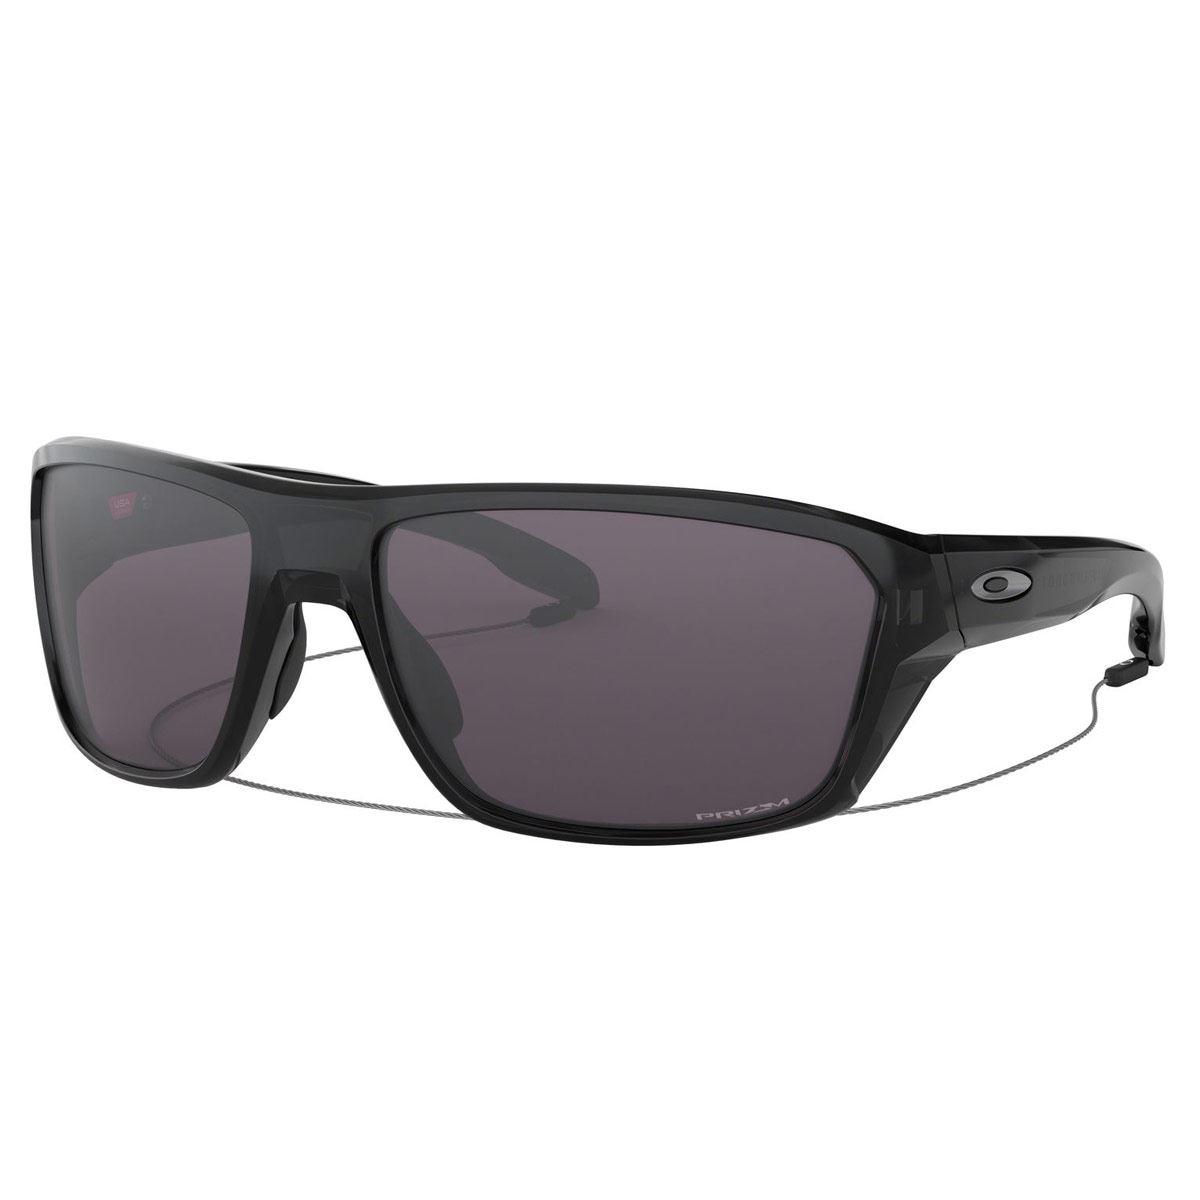 Lente de sol Oakley Split Shot gris con armazón negro